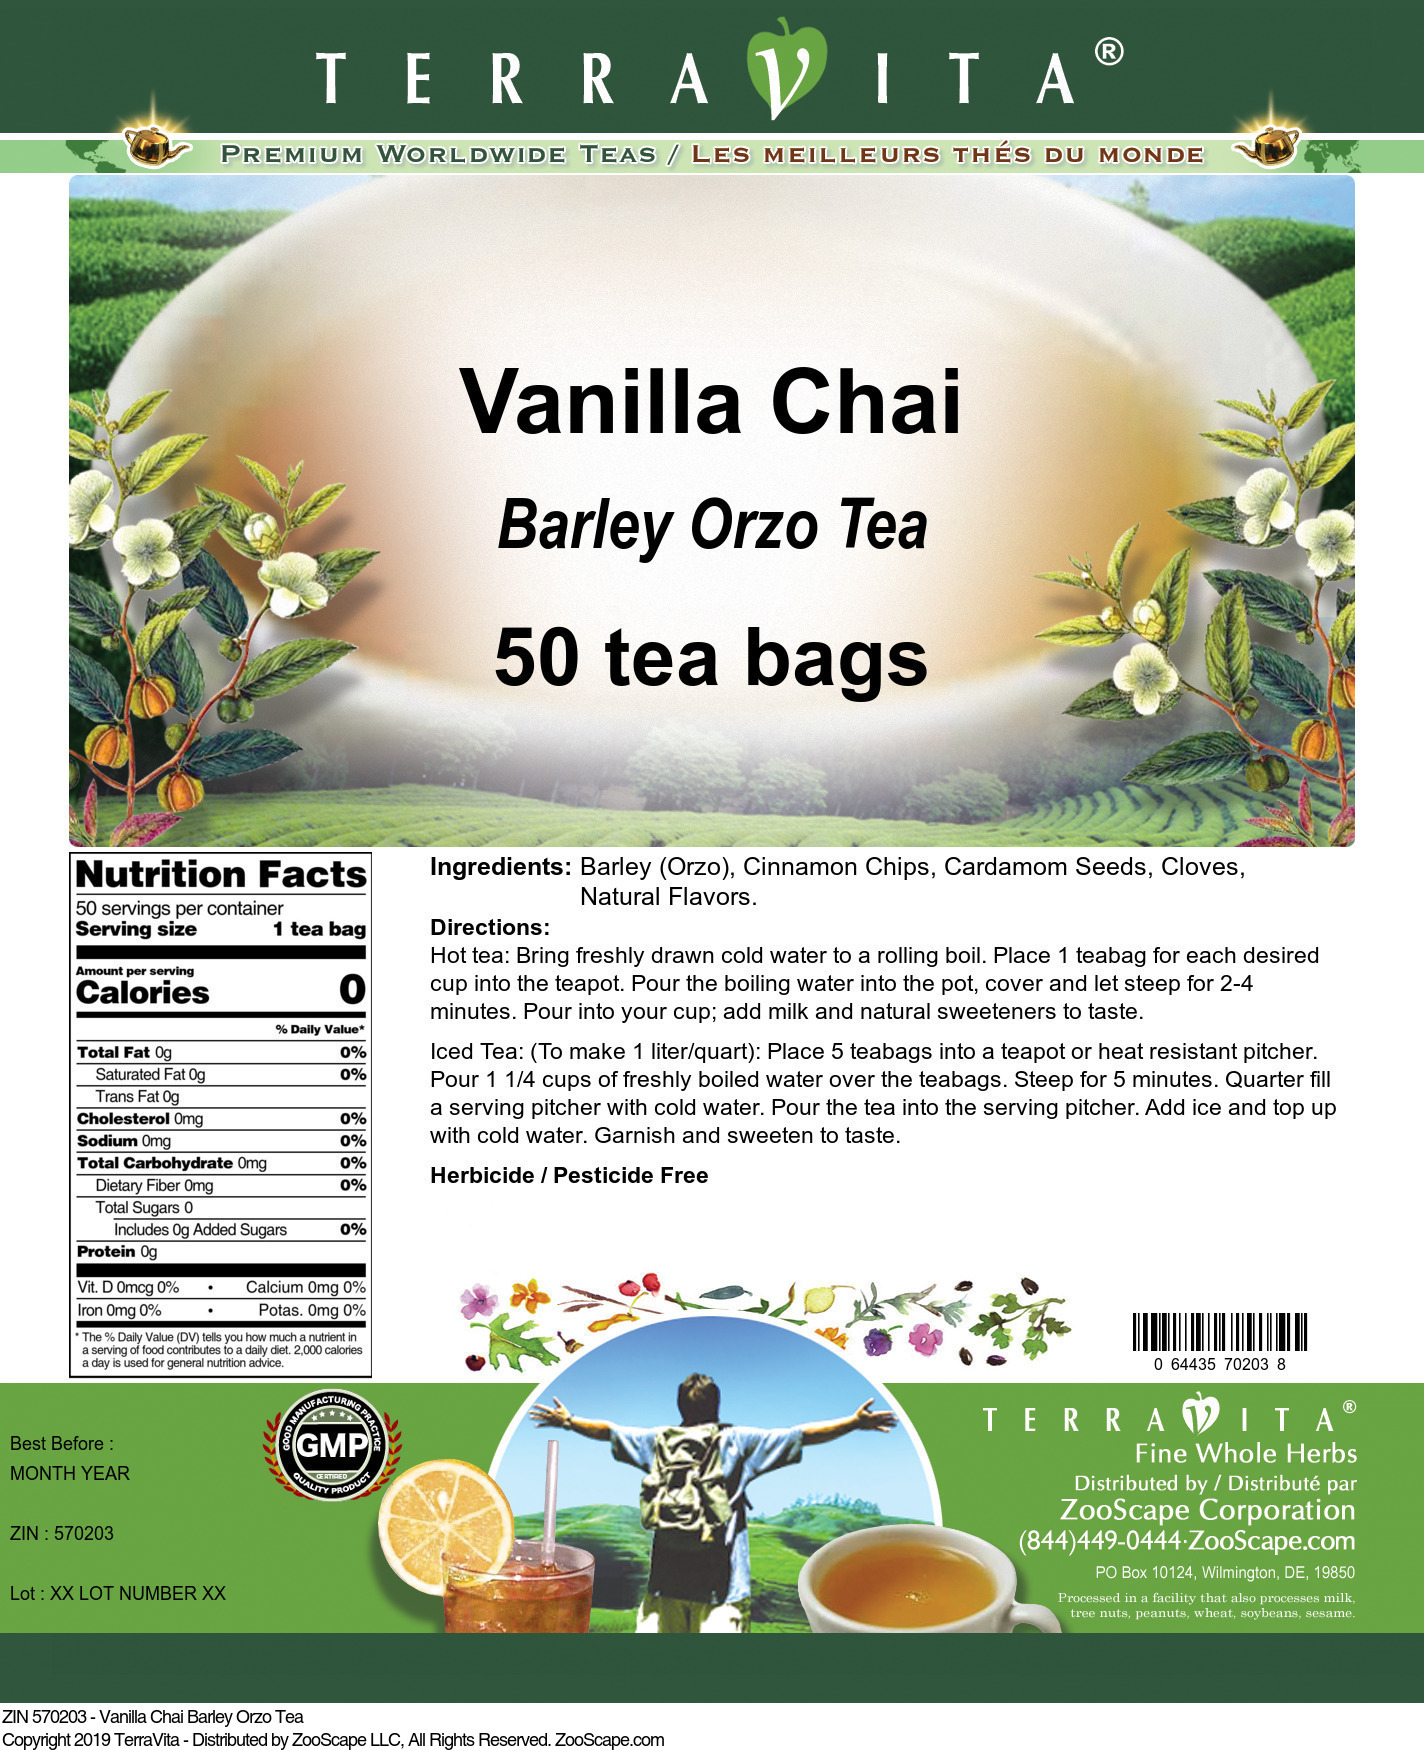 Vanilla Chai Barley Orzo Tea